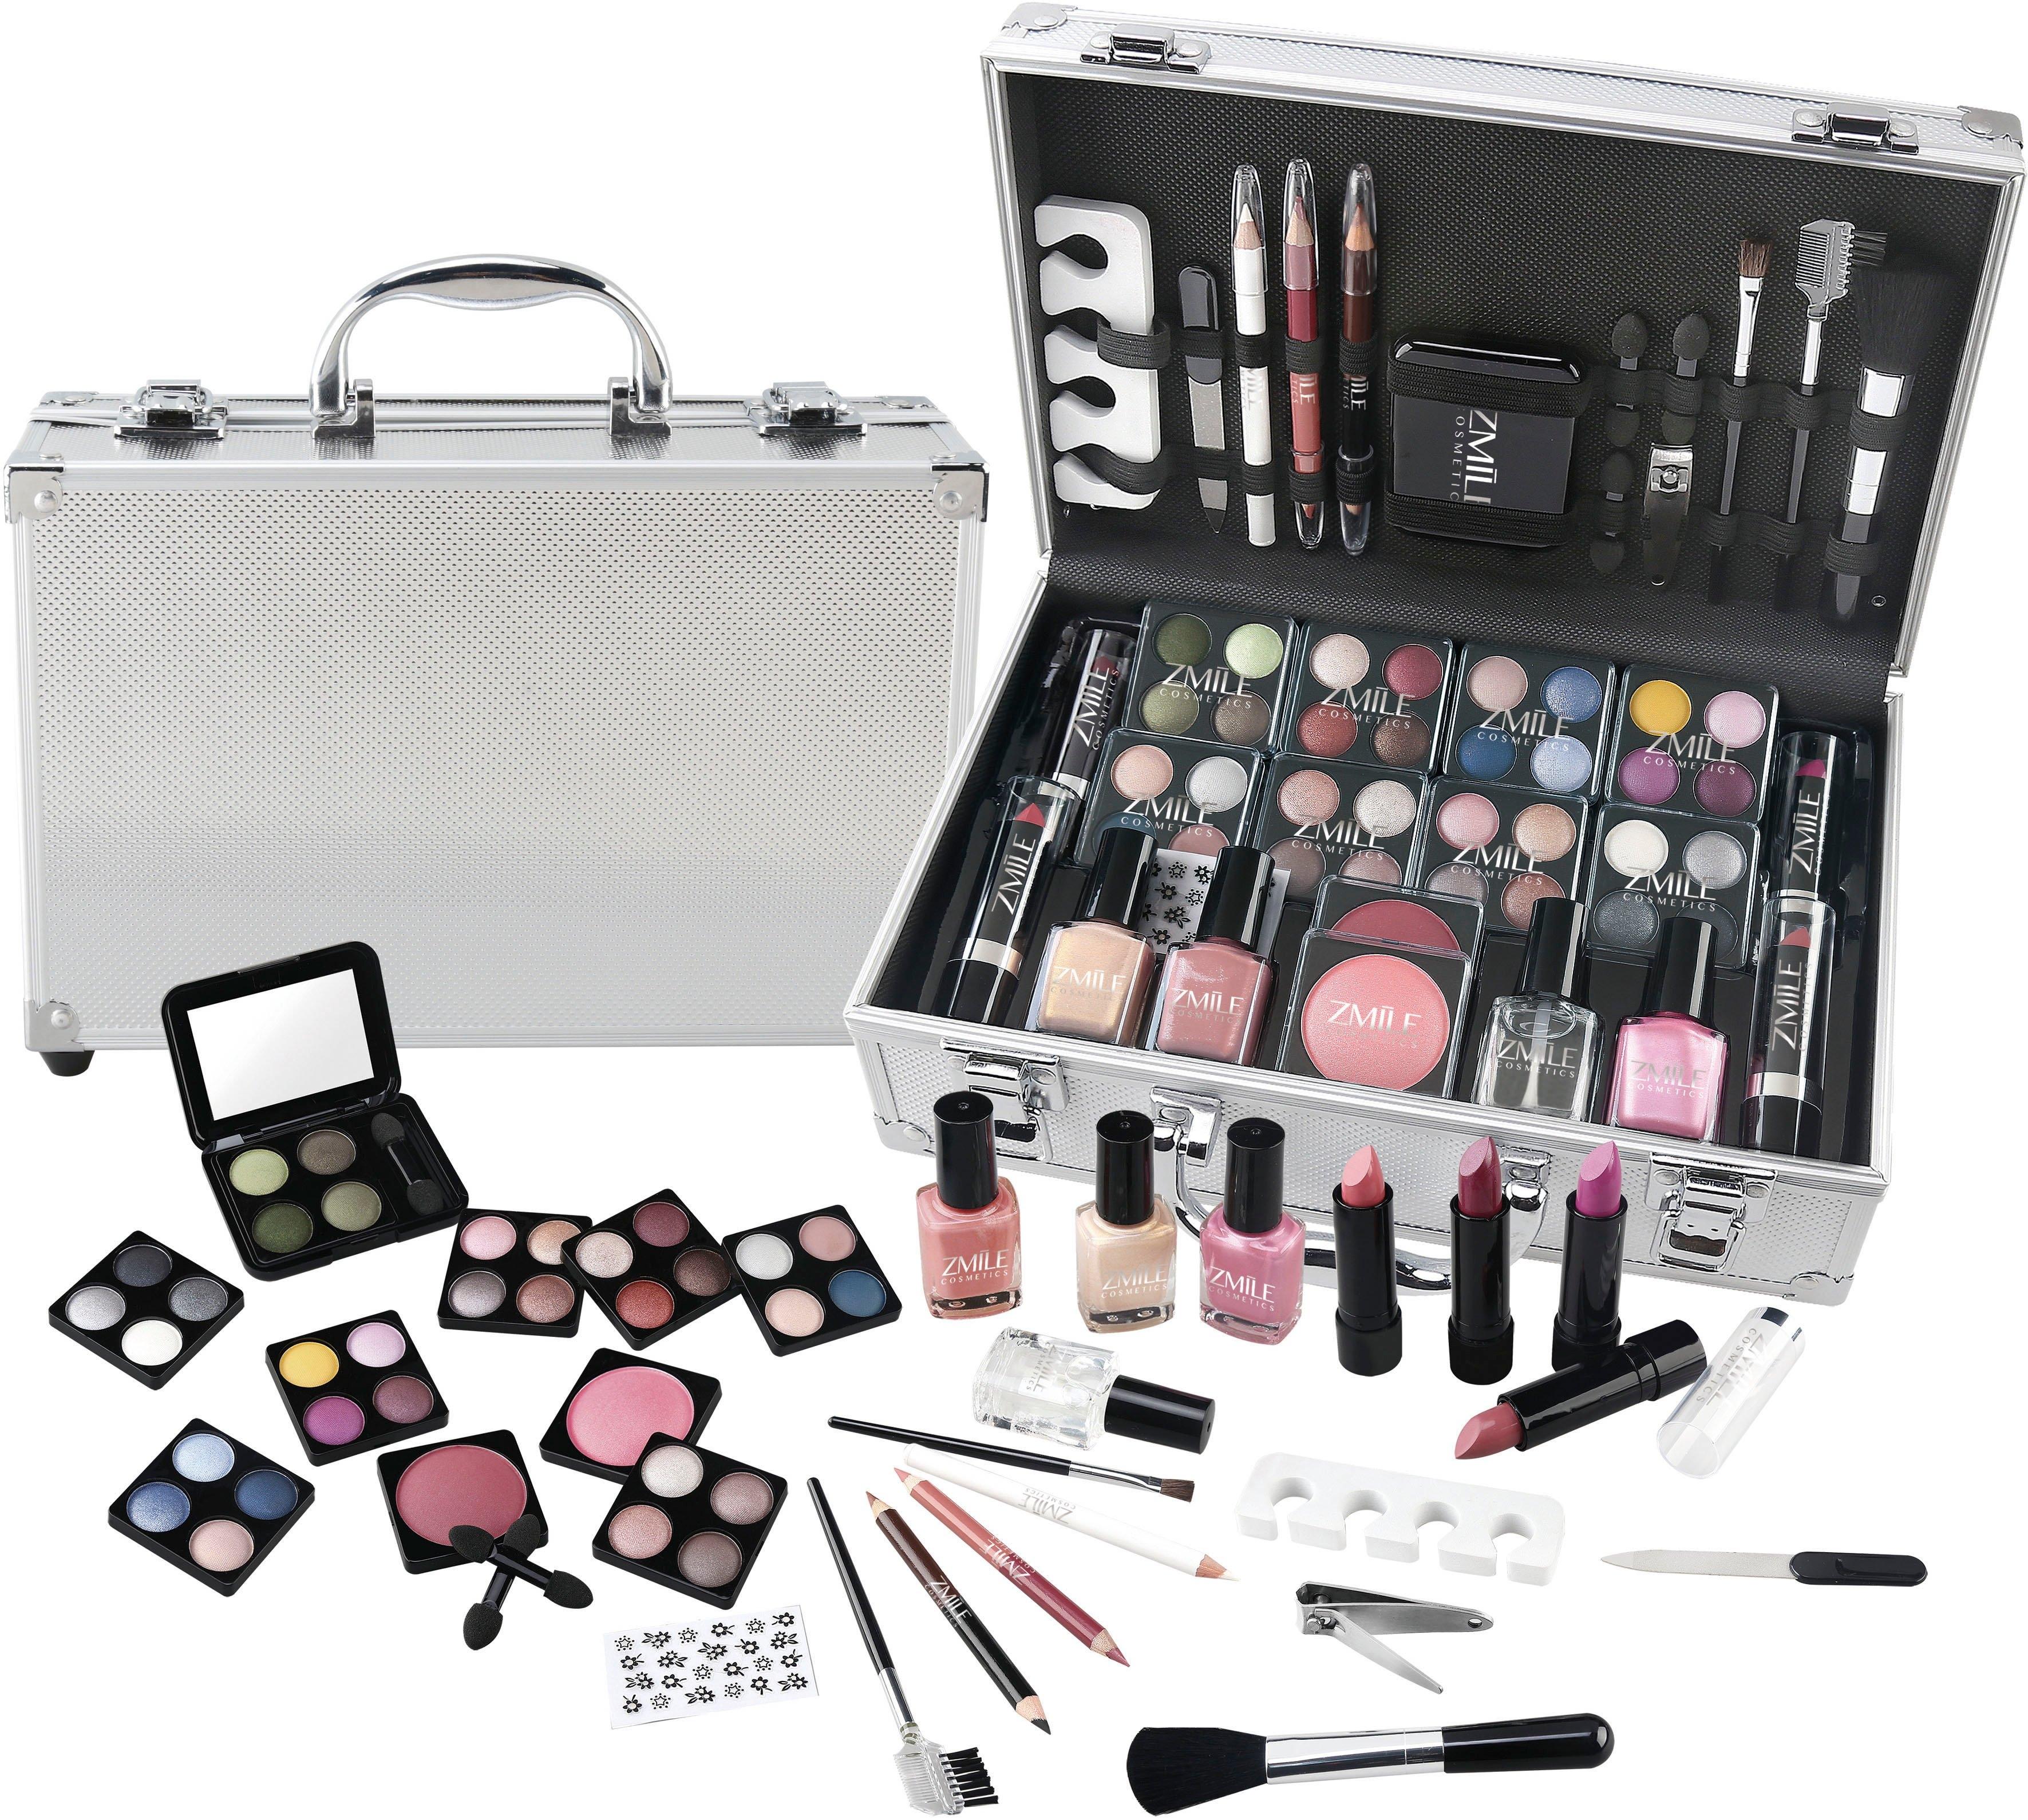 ZMILE COSMETICS make-upkoffer (57 delig) - verschillende betaalmethodes